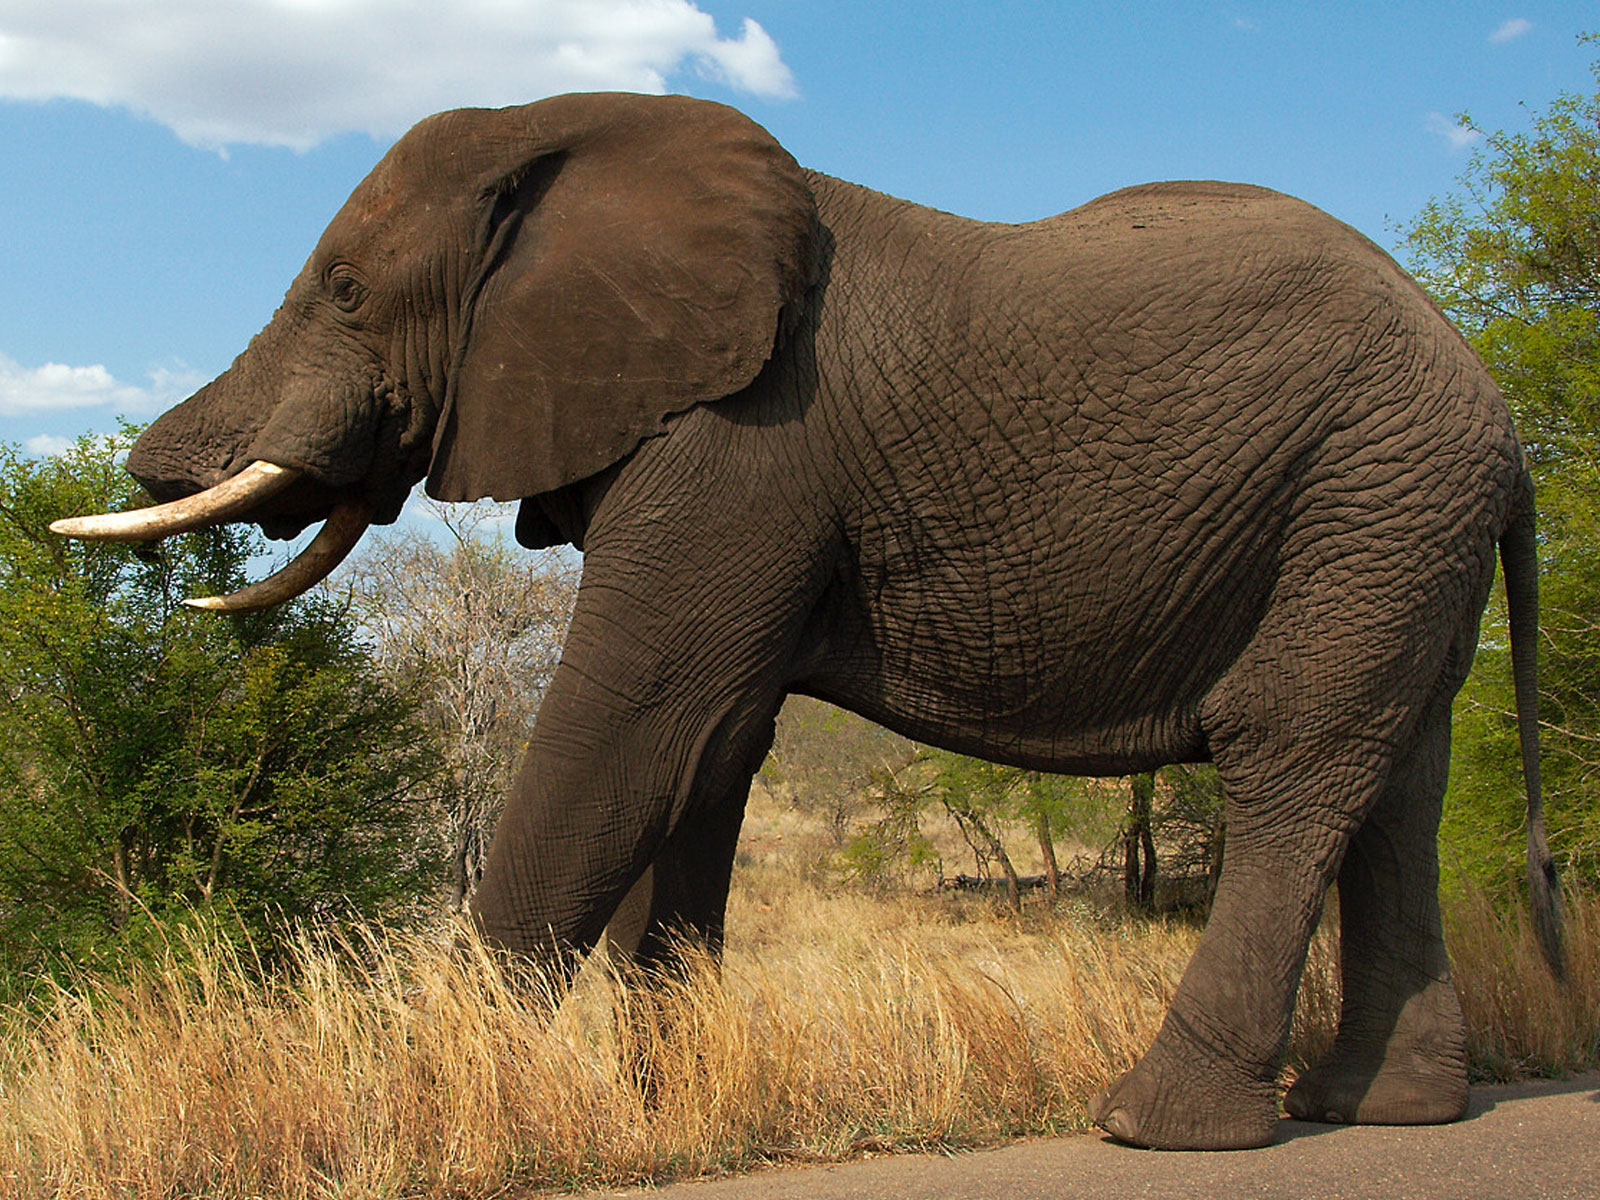 Elephant And The Baby Elephant